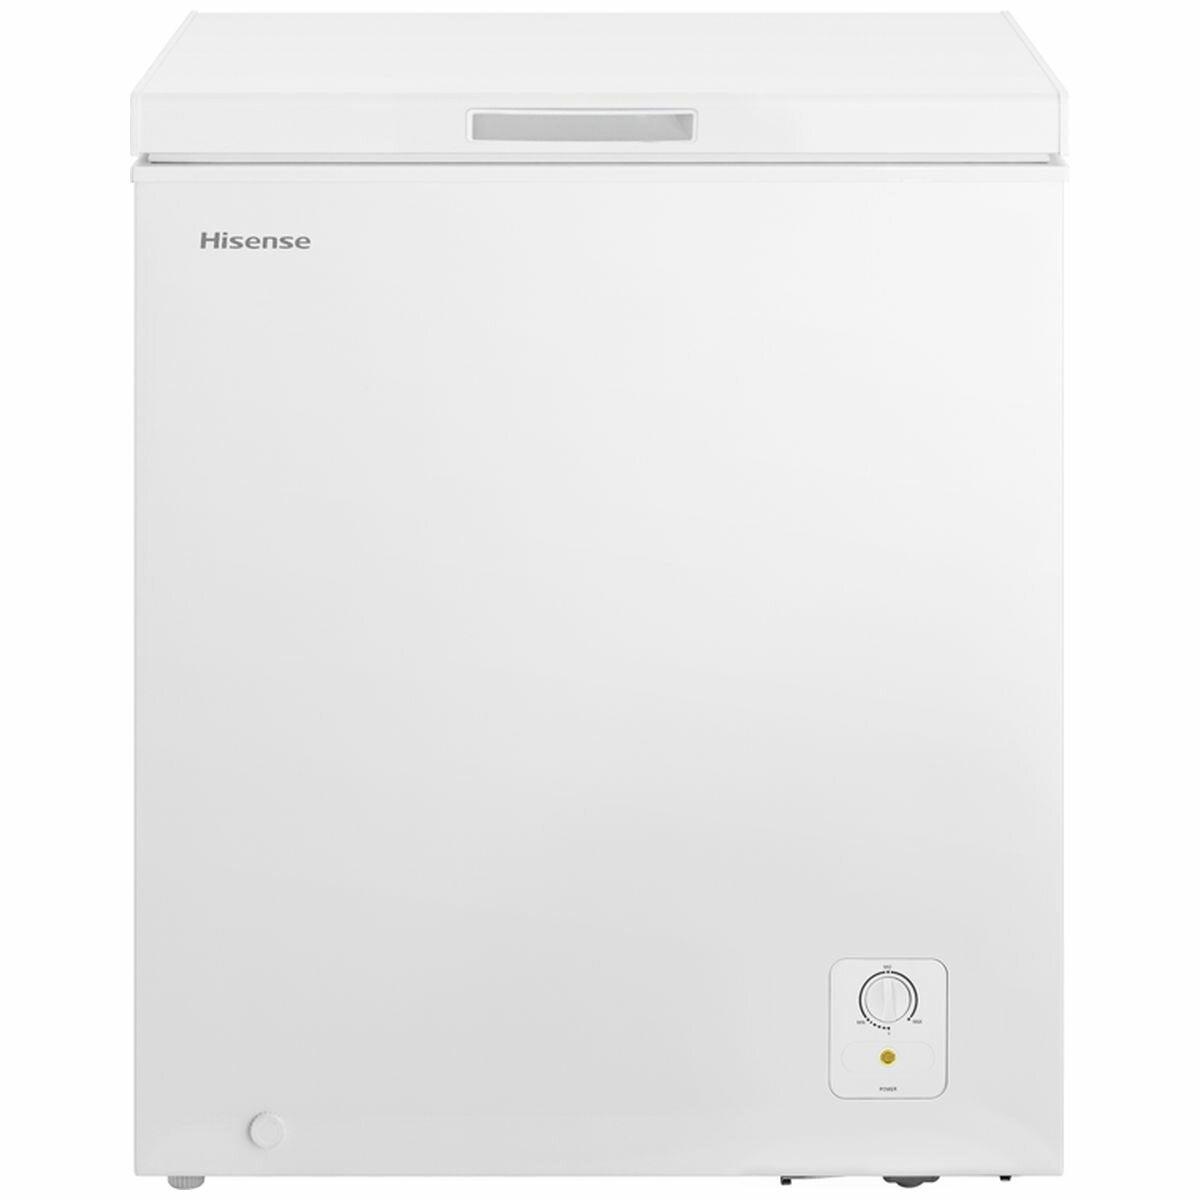 Hisense HR6CF144 Freezer